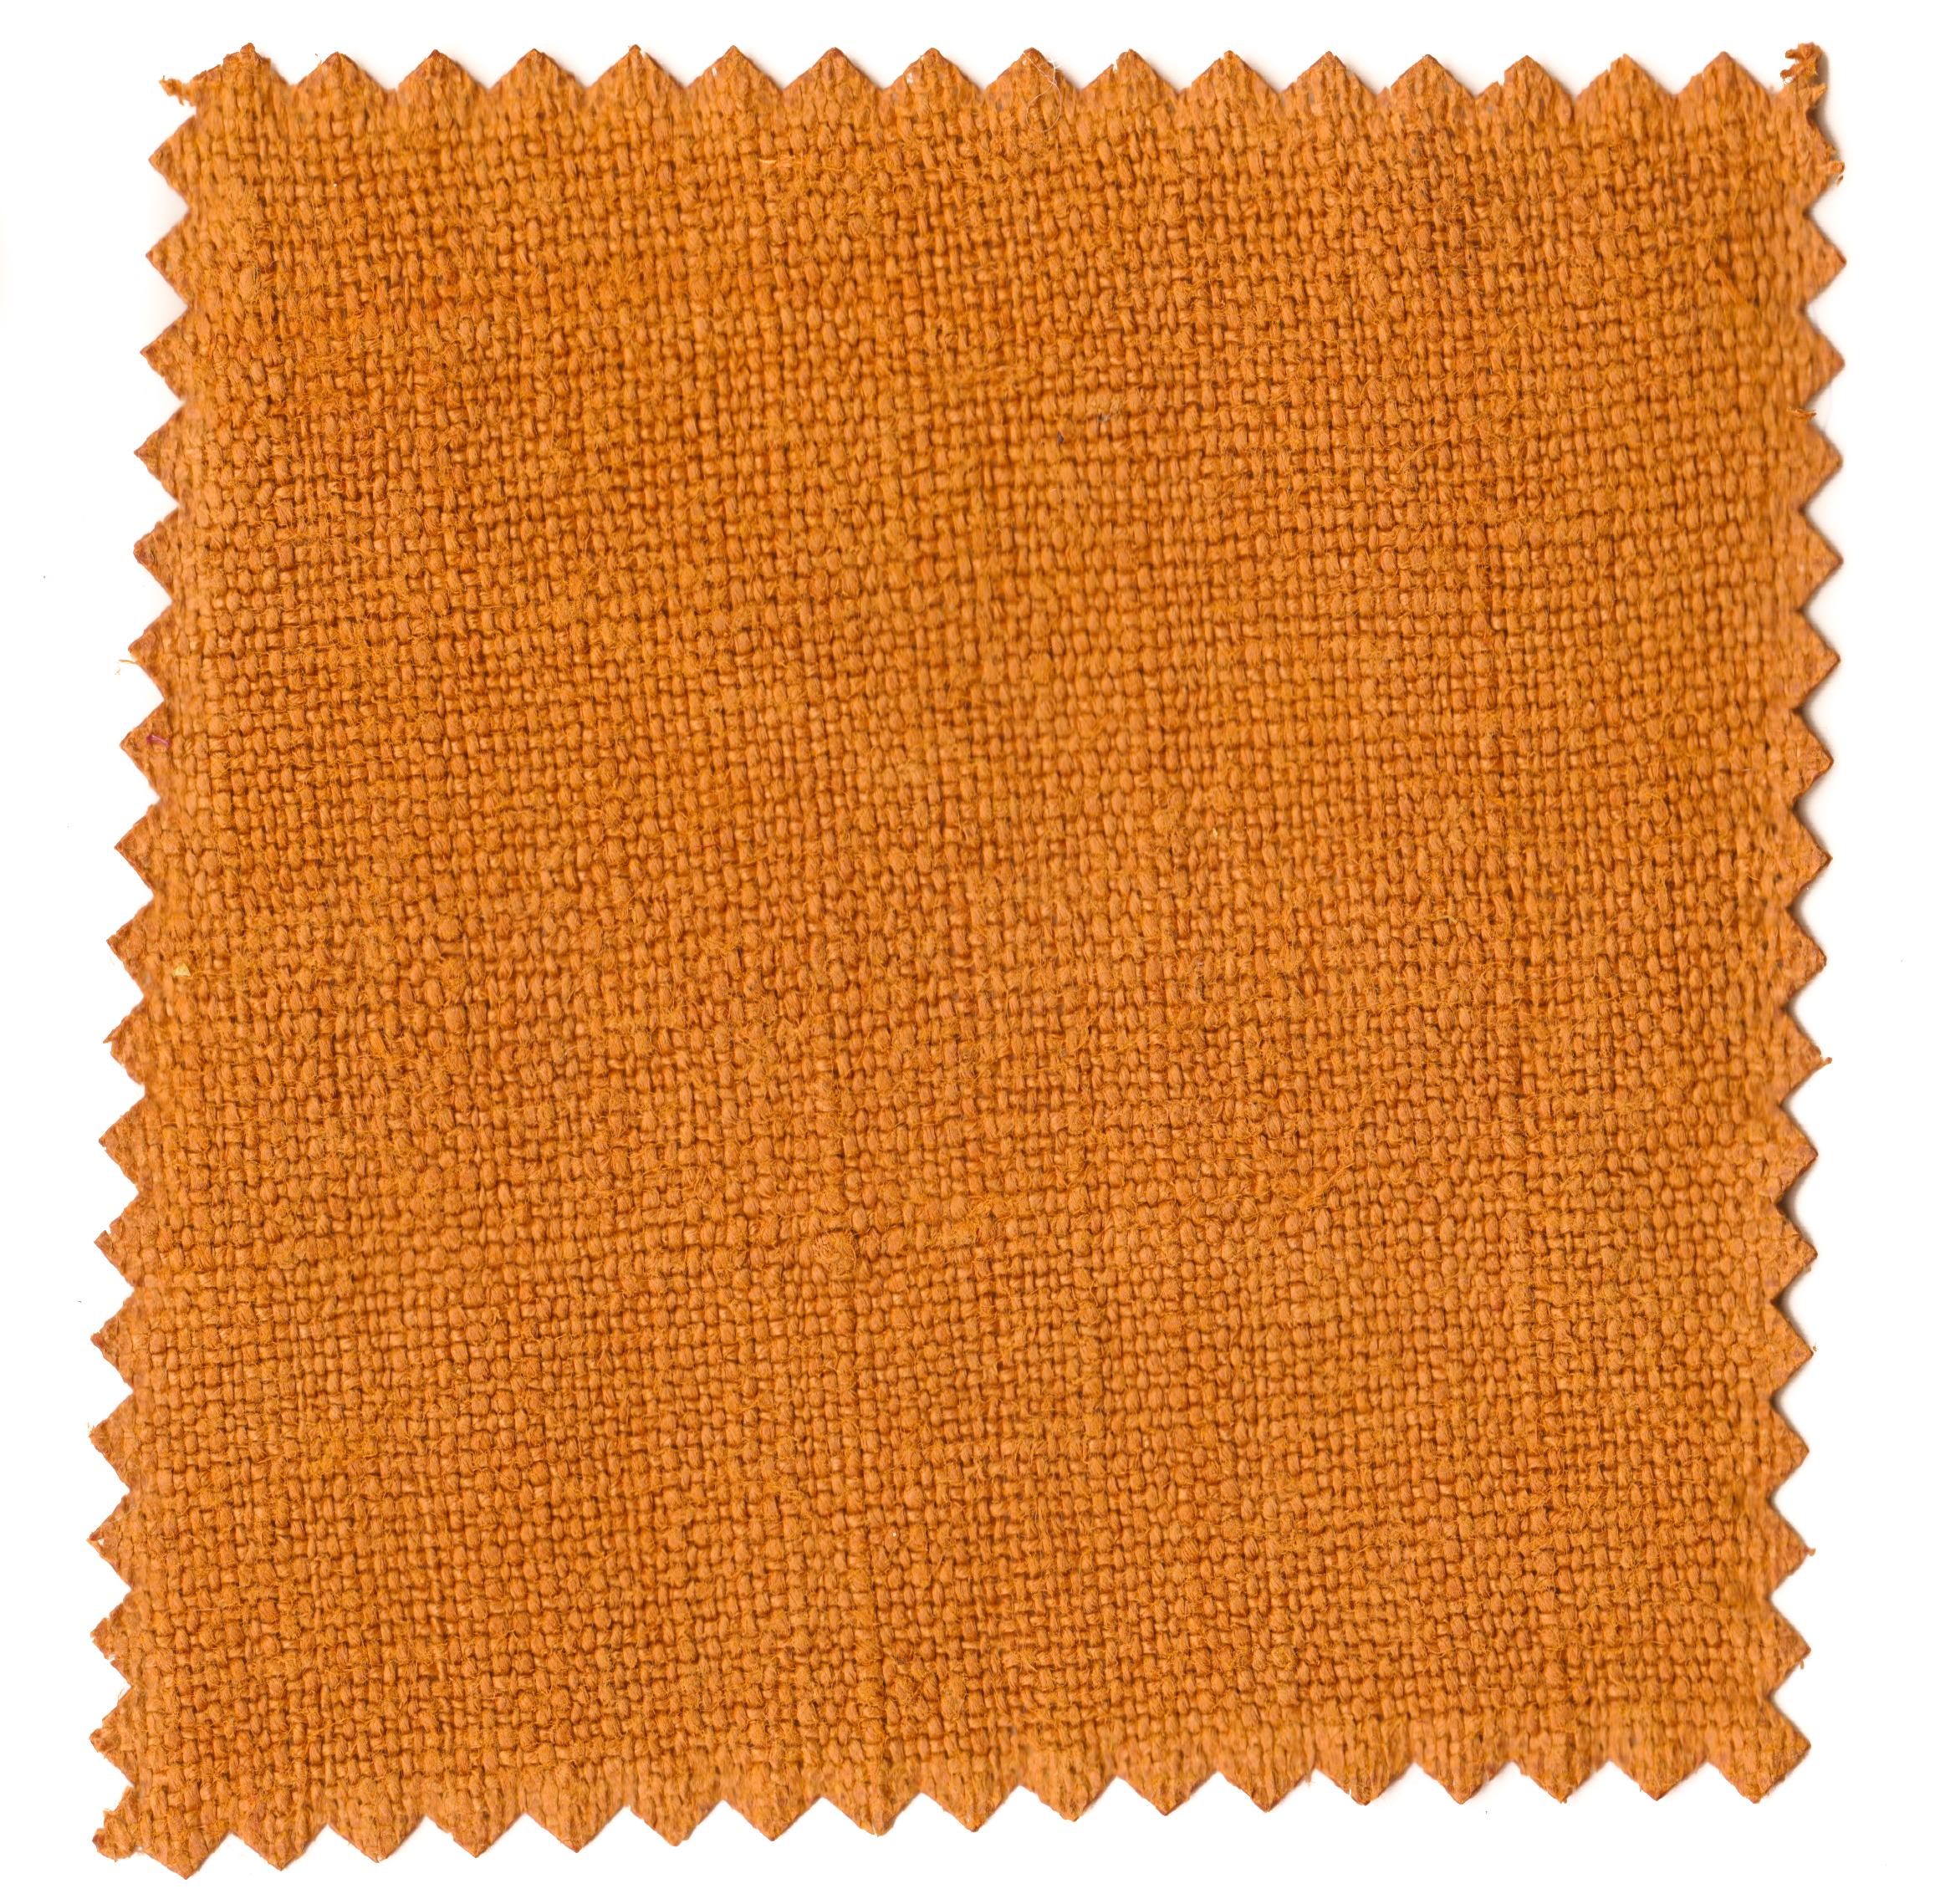 Saffron Umbers-7.jpg